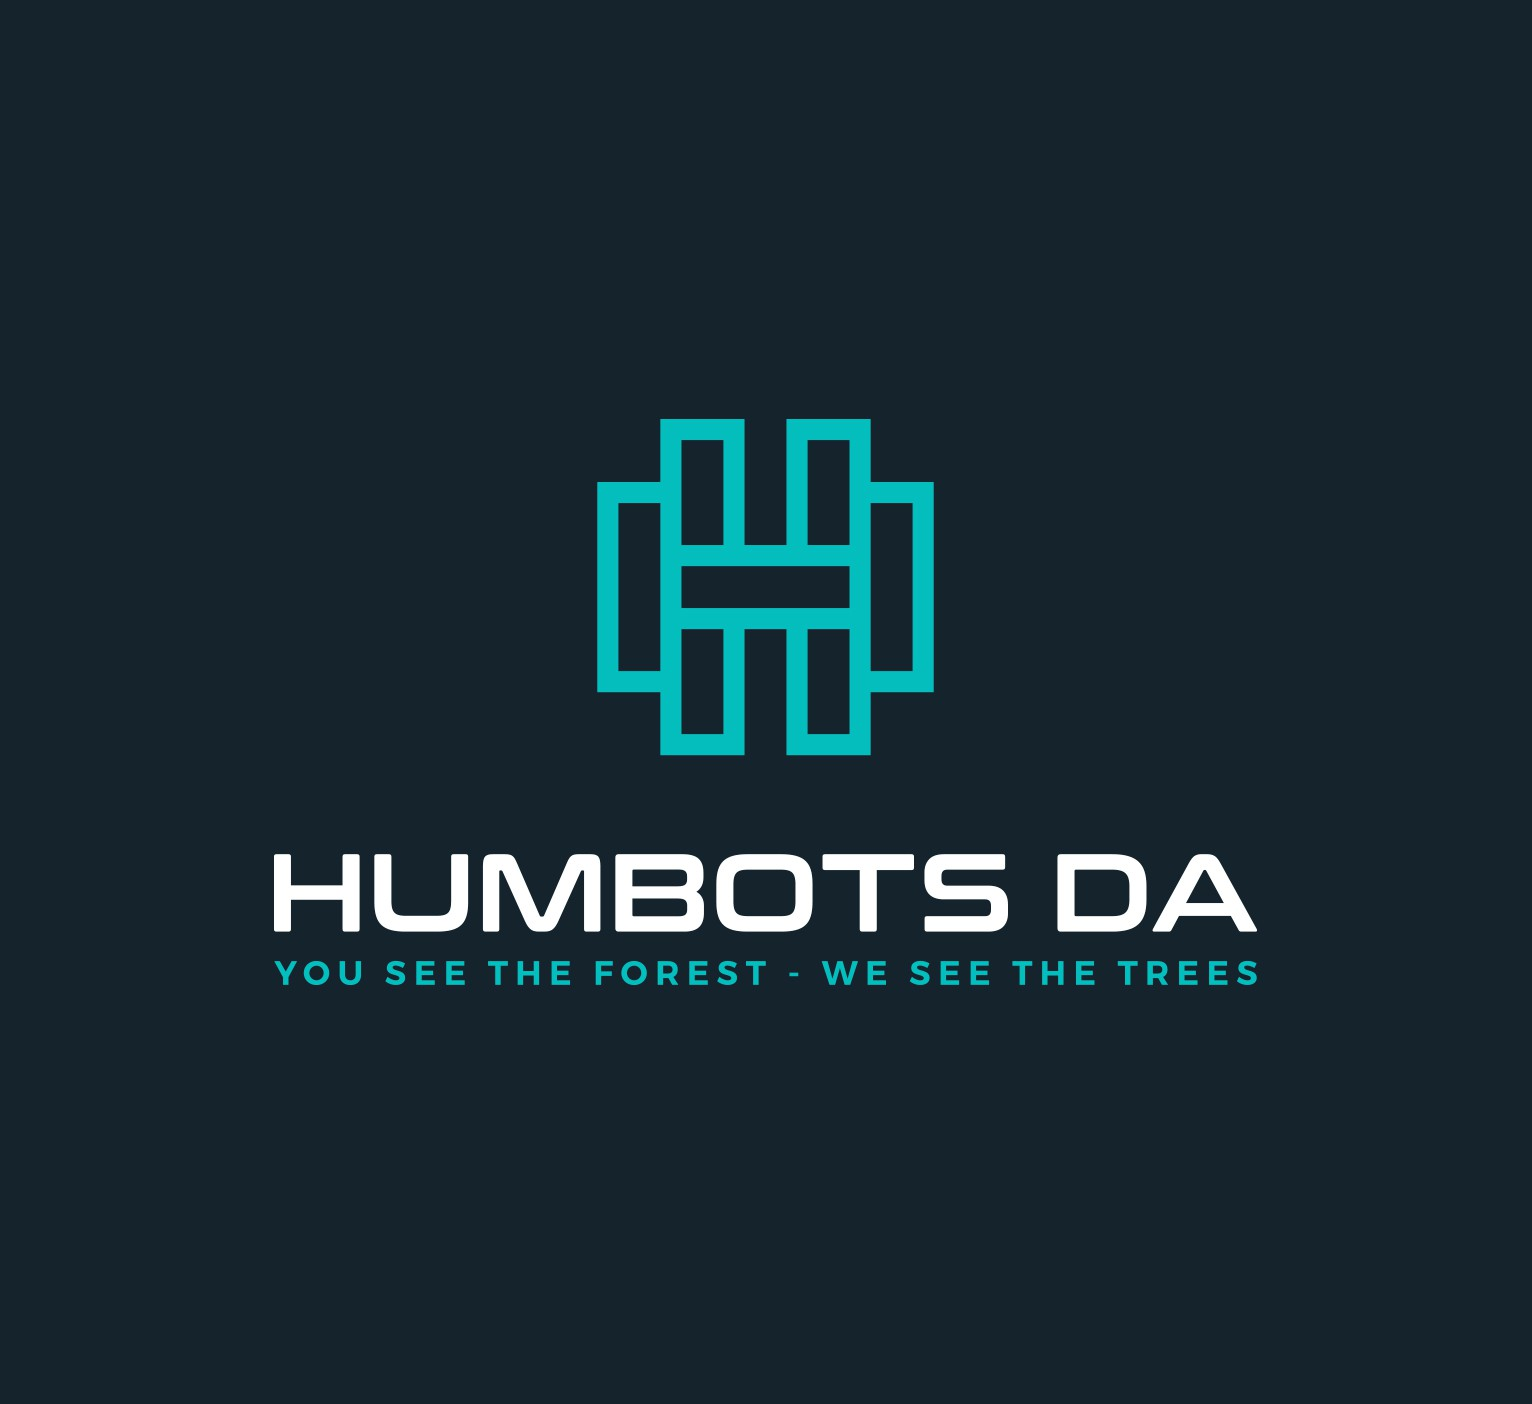 HumBots needs the perfect mashup of tech & tree...come wow us!